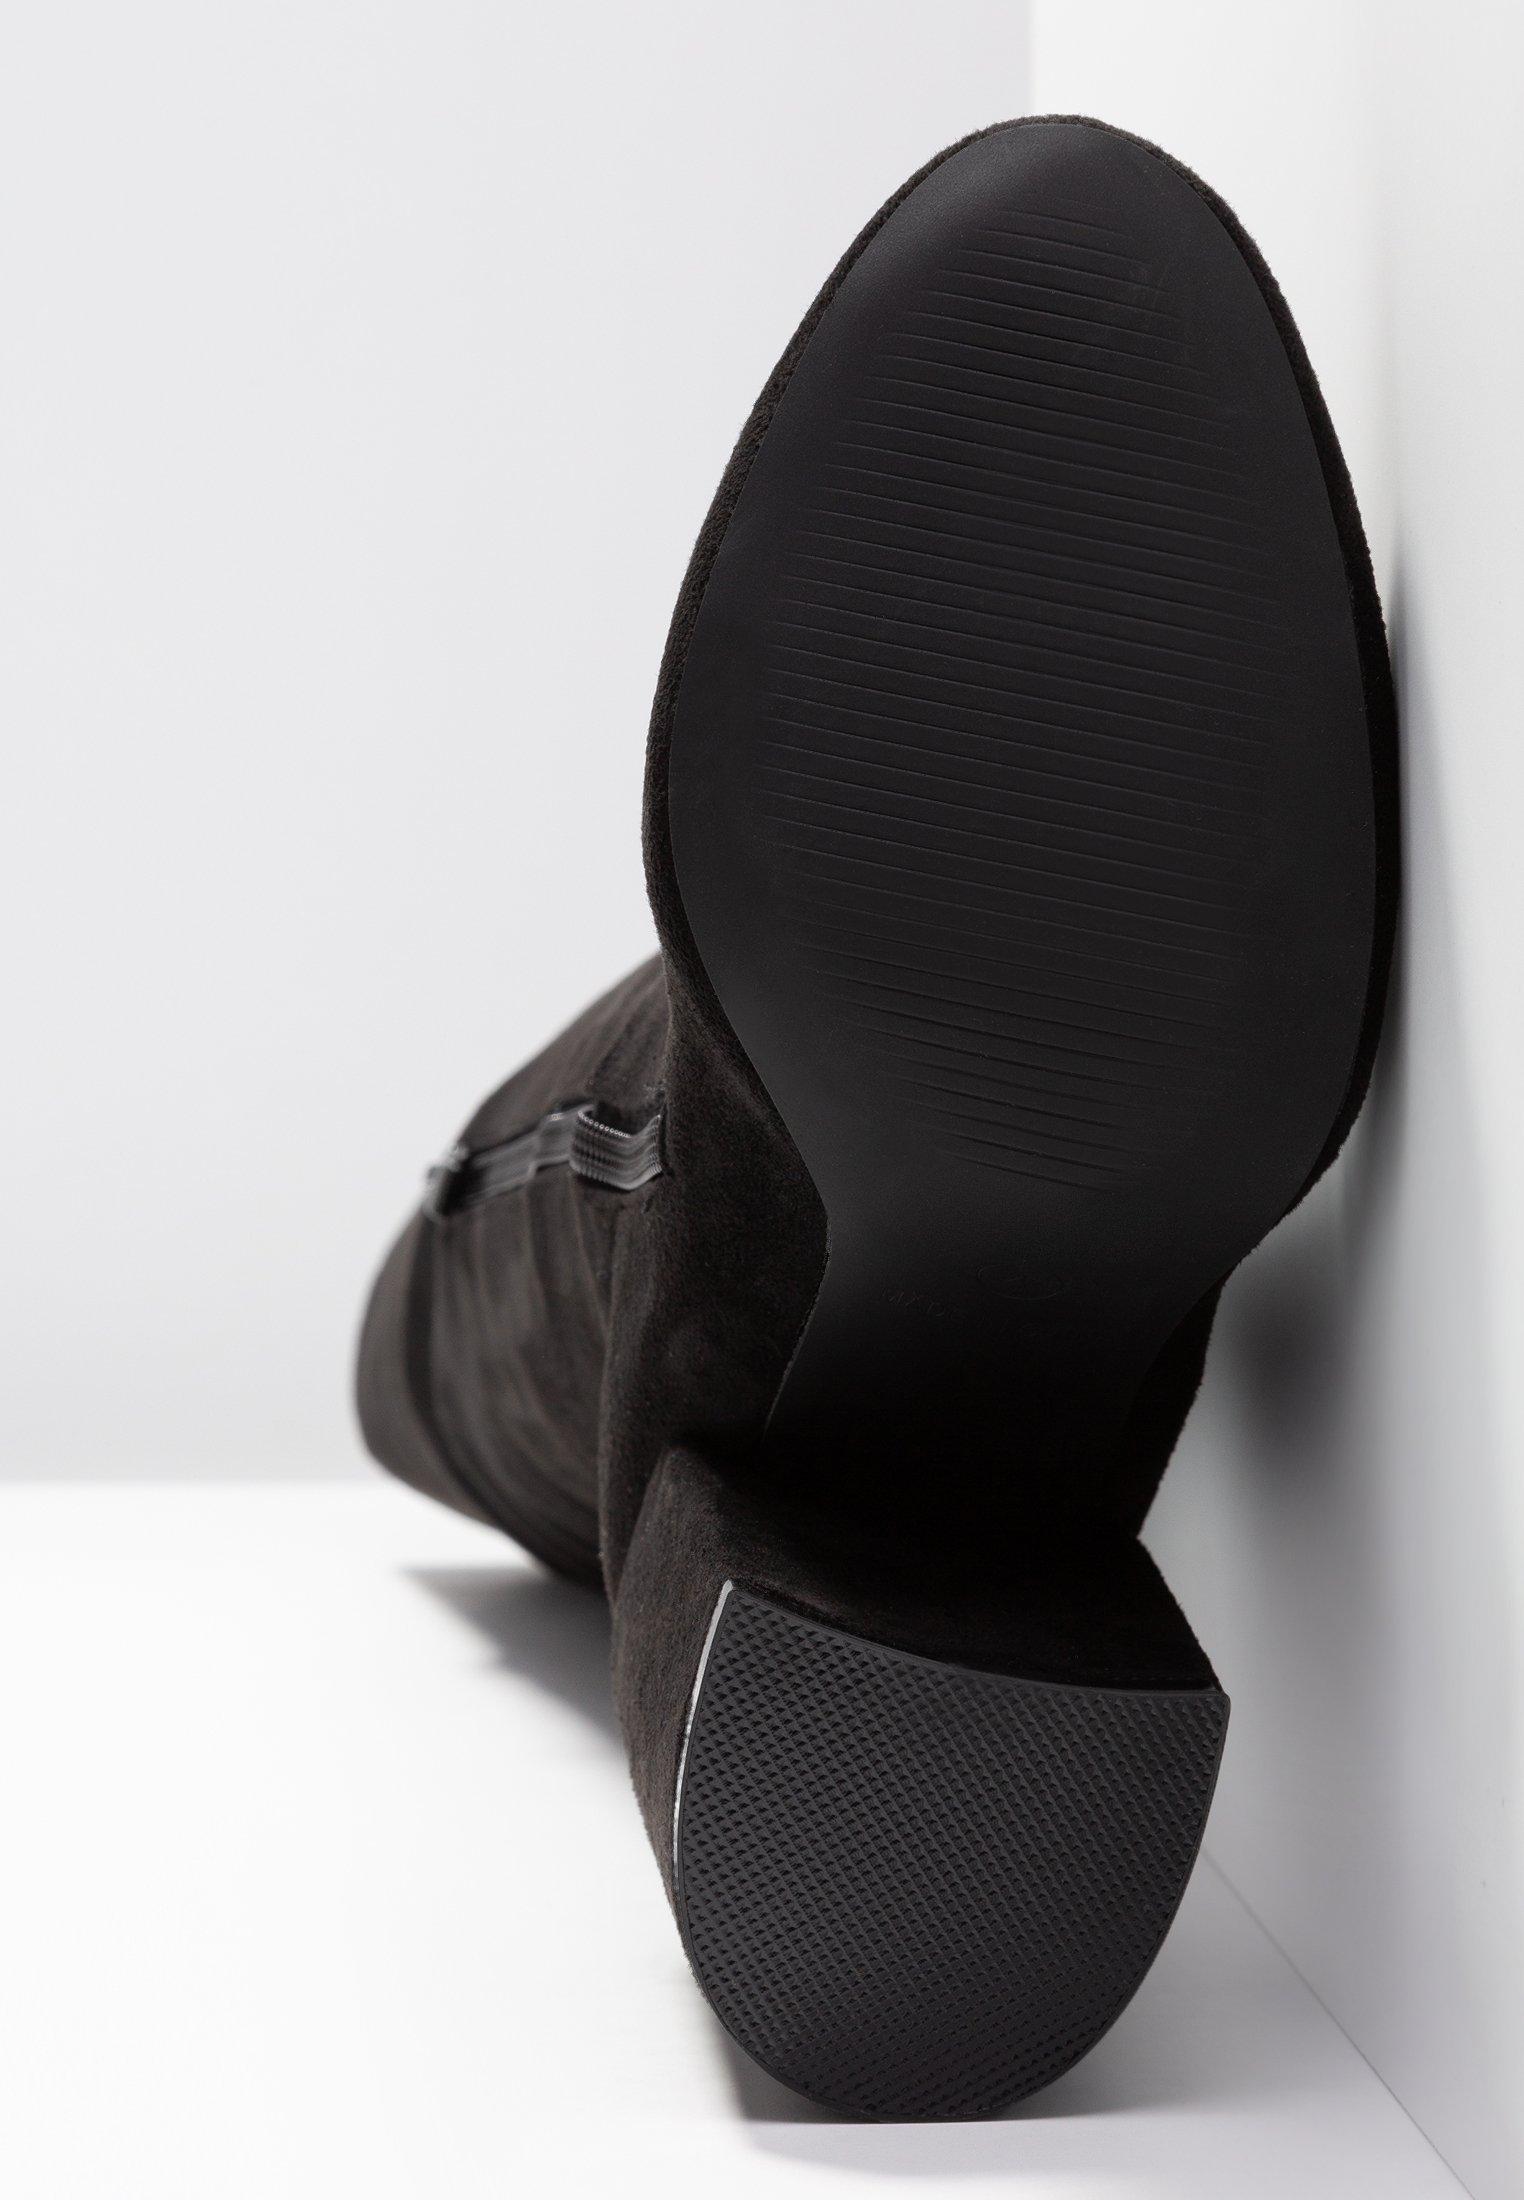 RAID EDITTA High Heel Stiefel black/schwarz